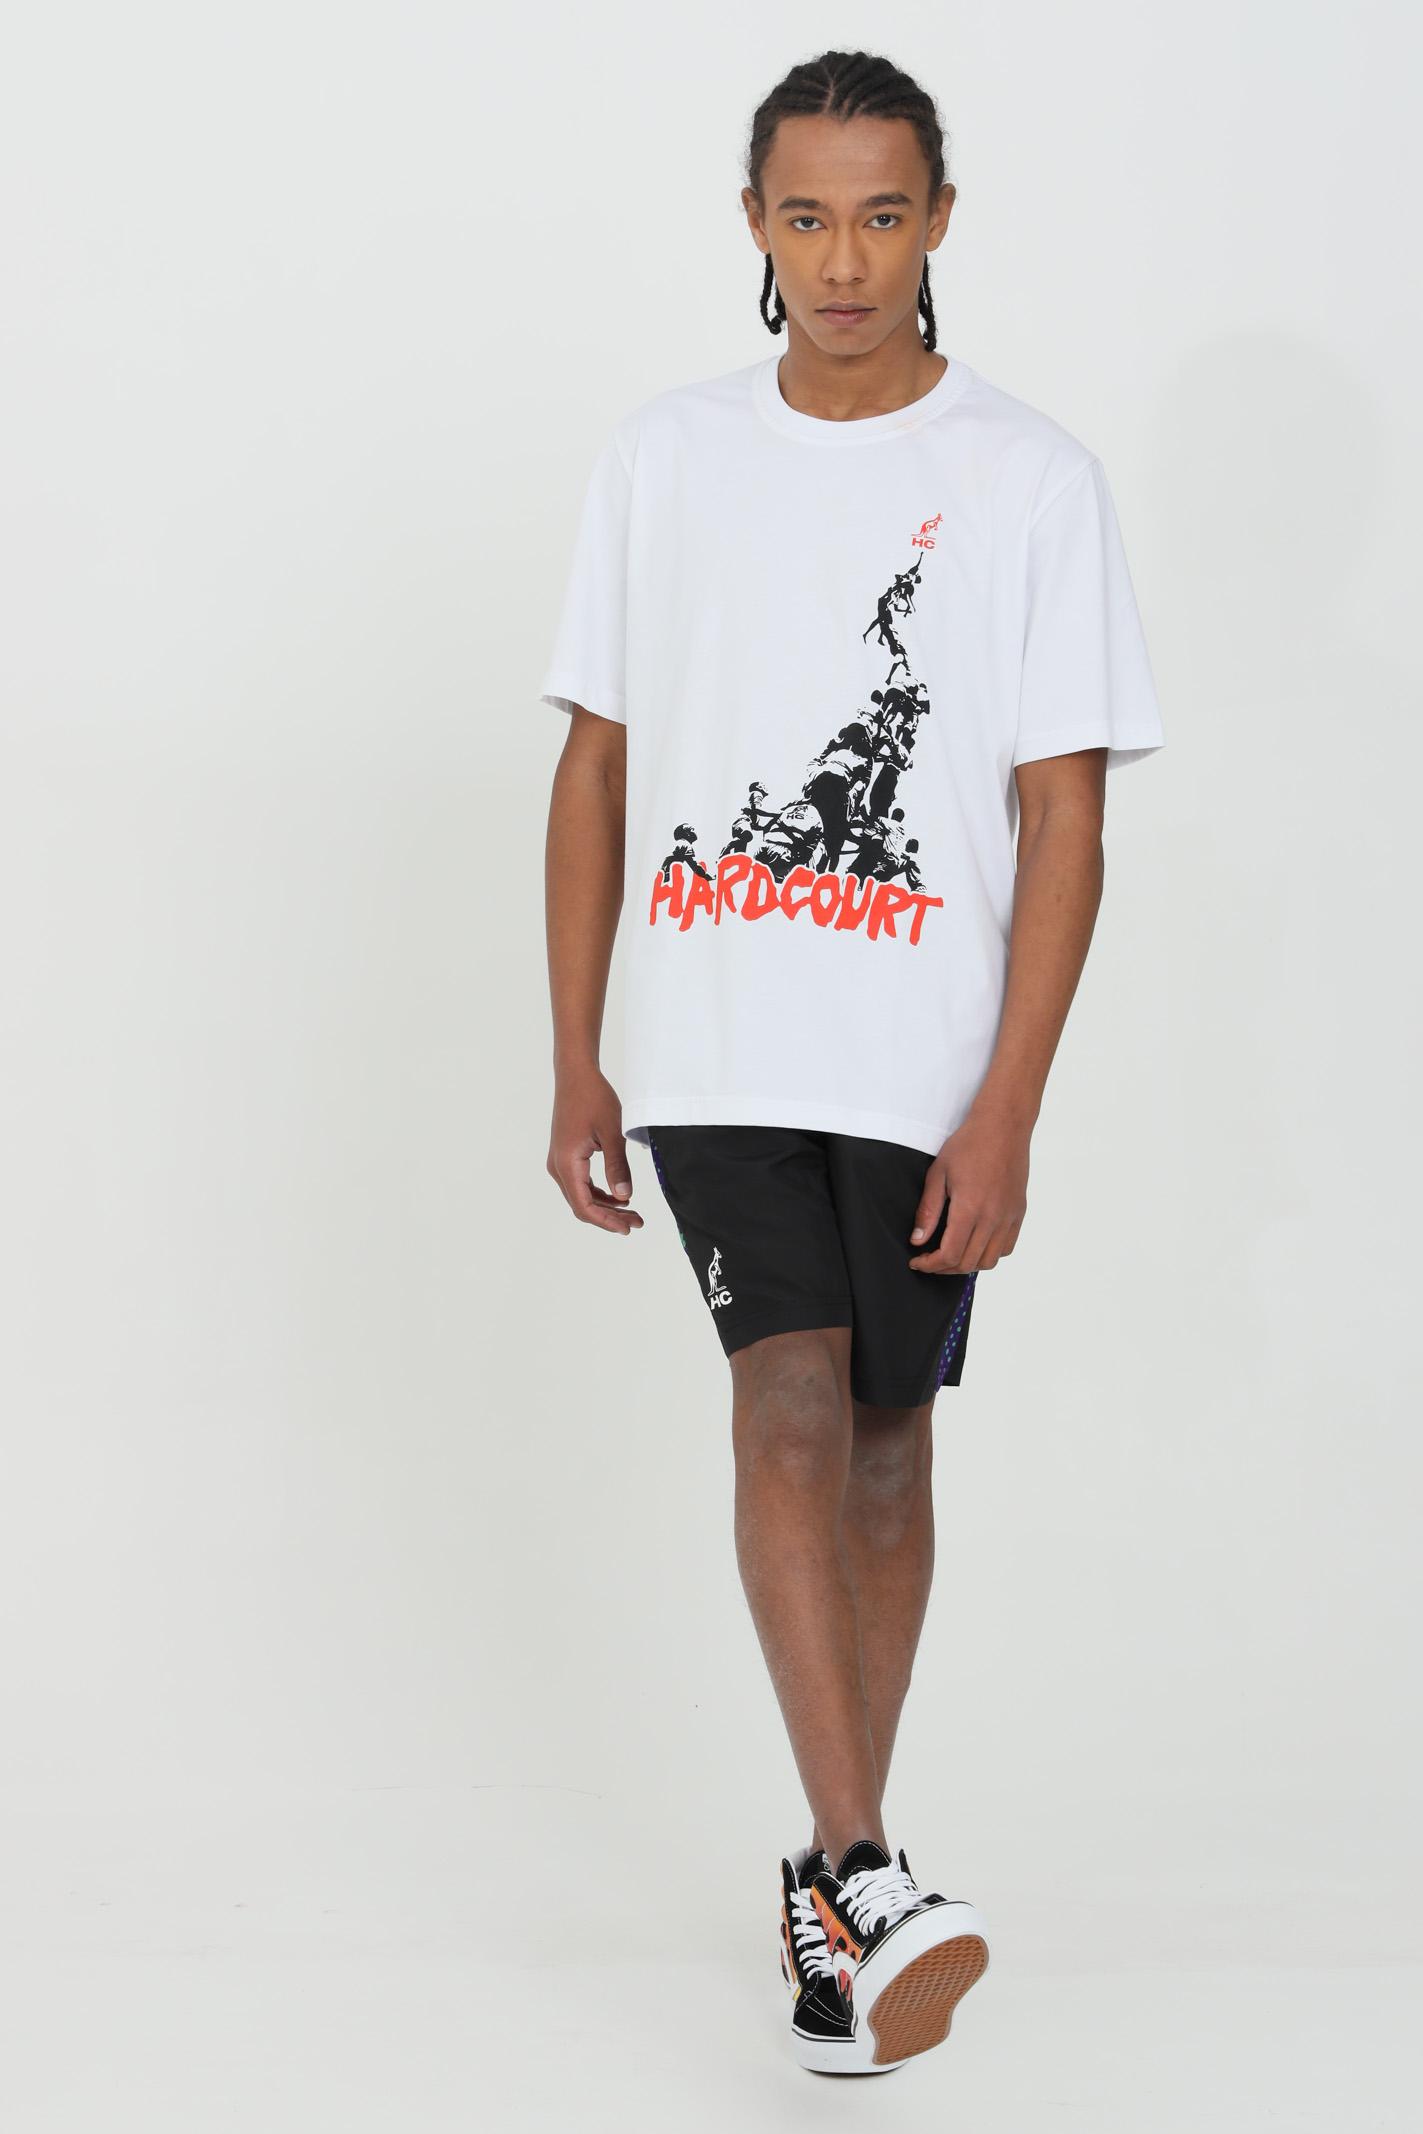 T-shirt uomo bianco Australian a manica corta e logo frontale.Modello comodo AUSTRALIAN | T-shirt | HCUTS0010002